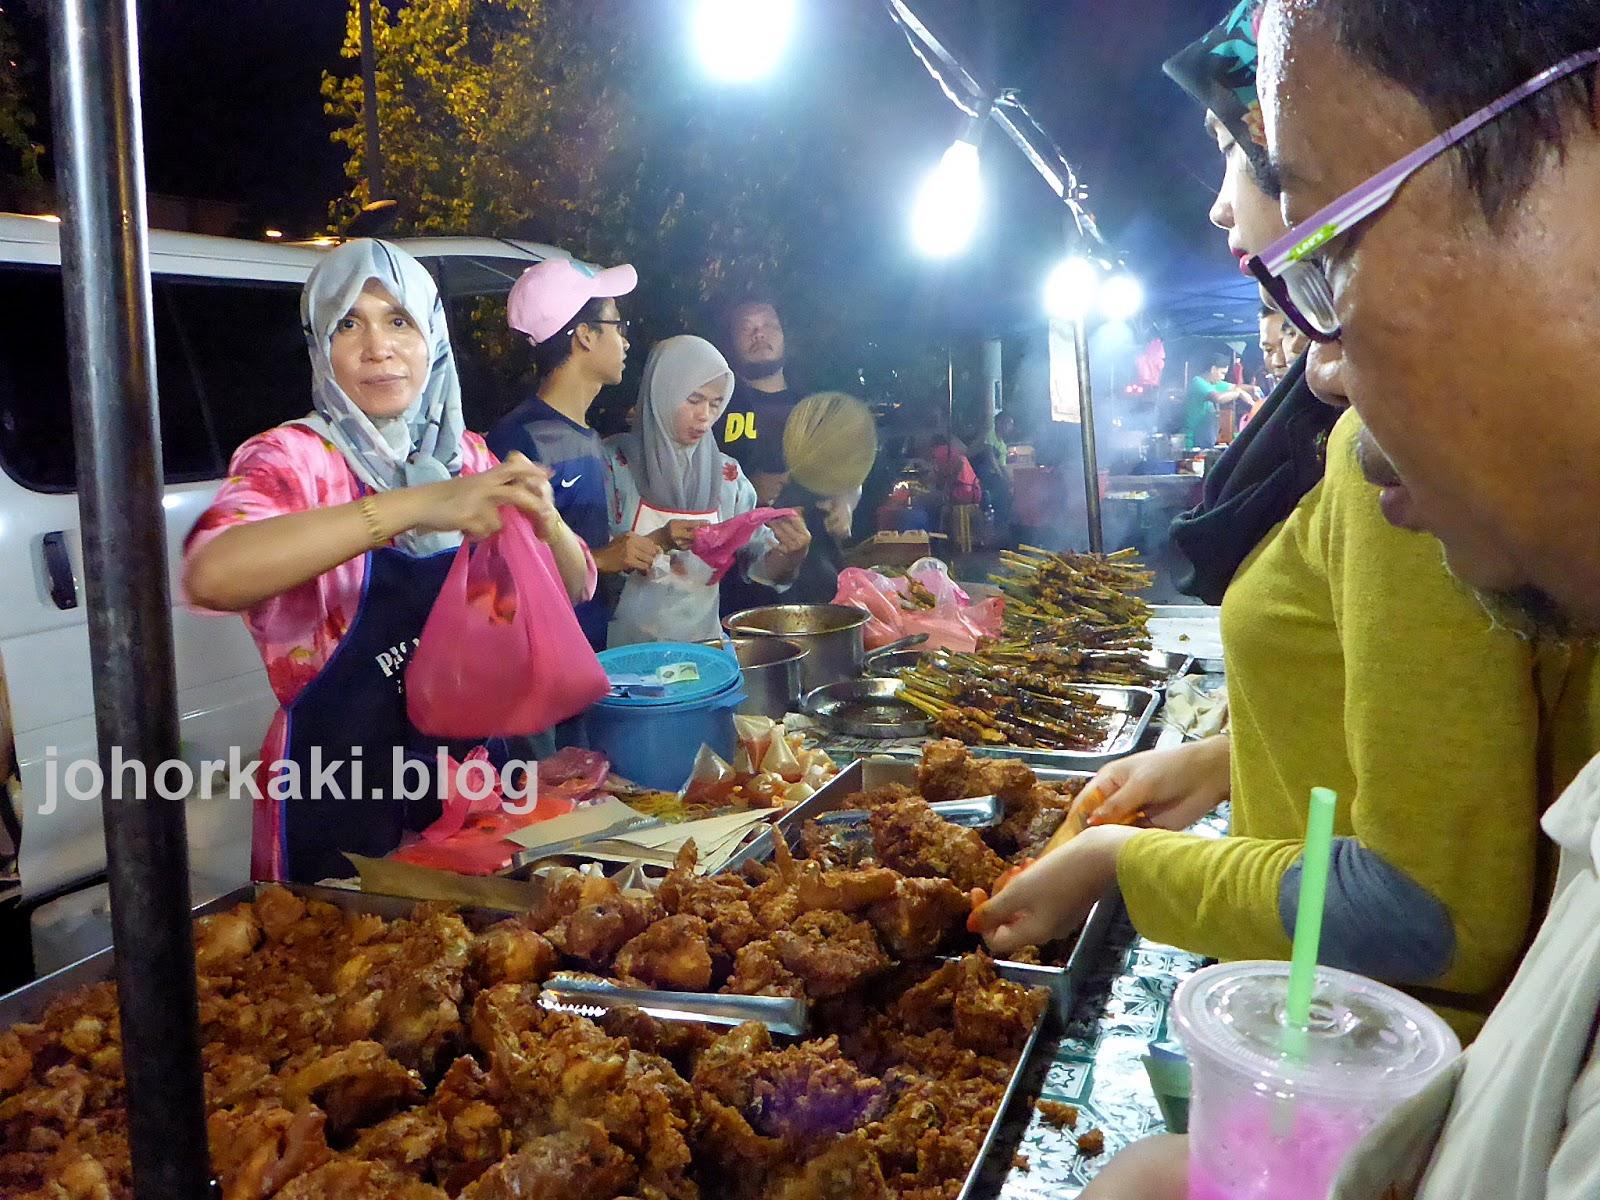 the malaysian sibu pasar malam Pasar malam: malaysian night market - see 36 traveler reviews, 41 candid photos, and great deals for johor bahru, malaysia, at tripadvisor.